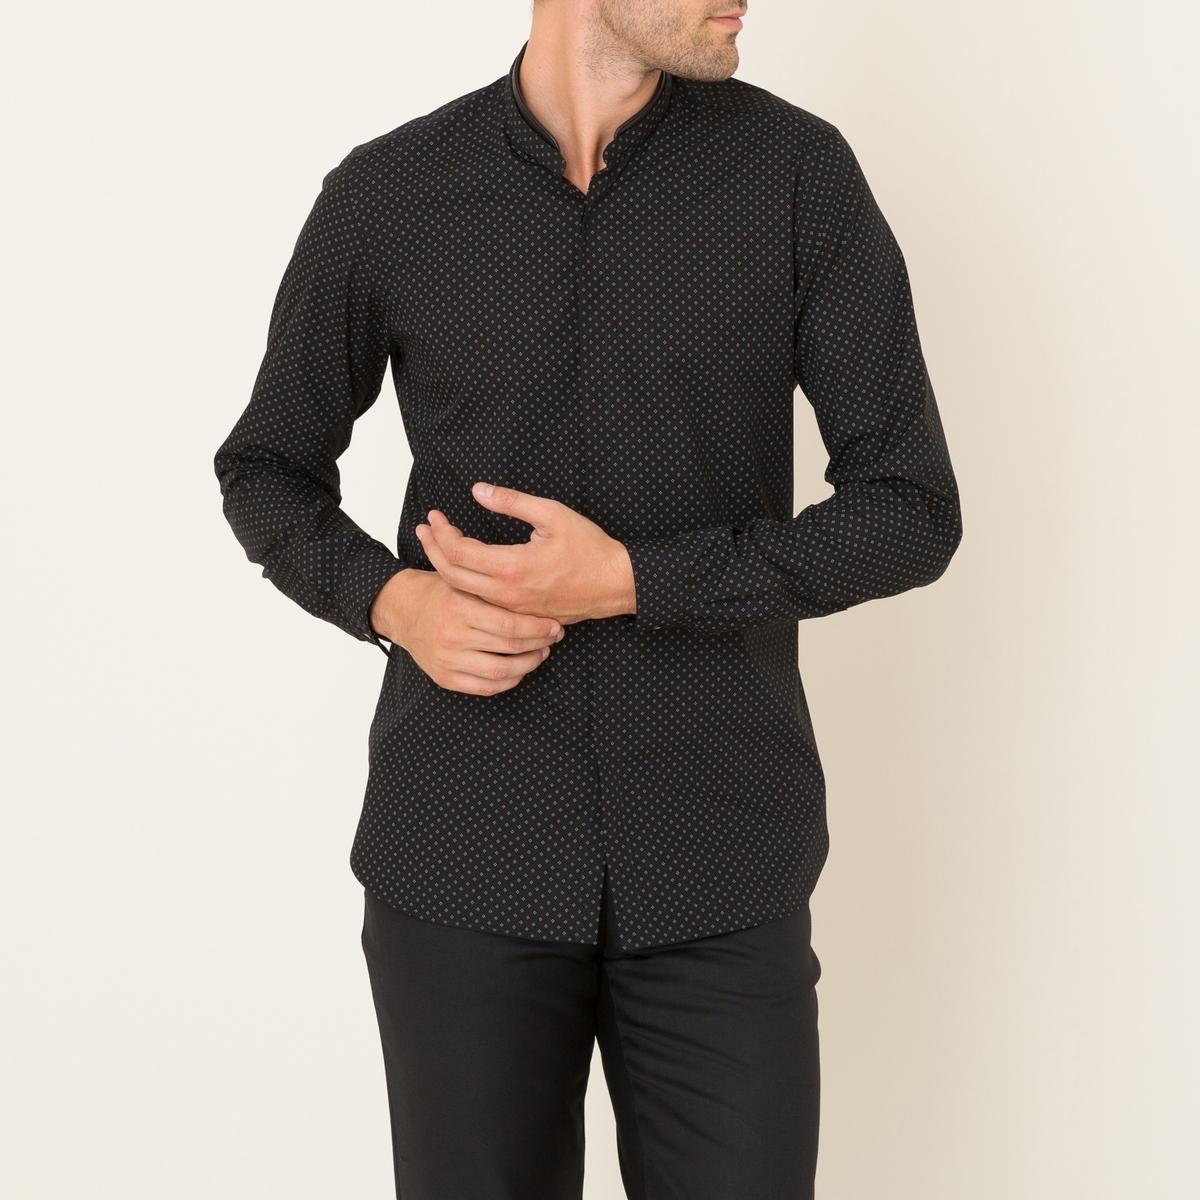 Рубашка с рисунком со вставкой из кожи от La Redoute